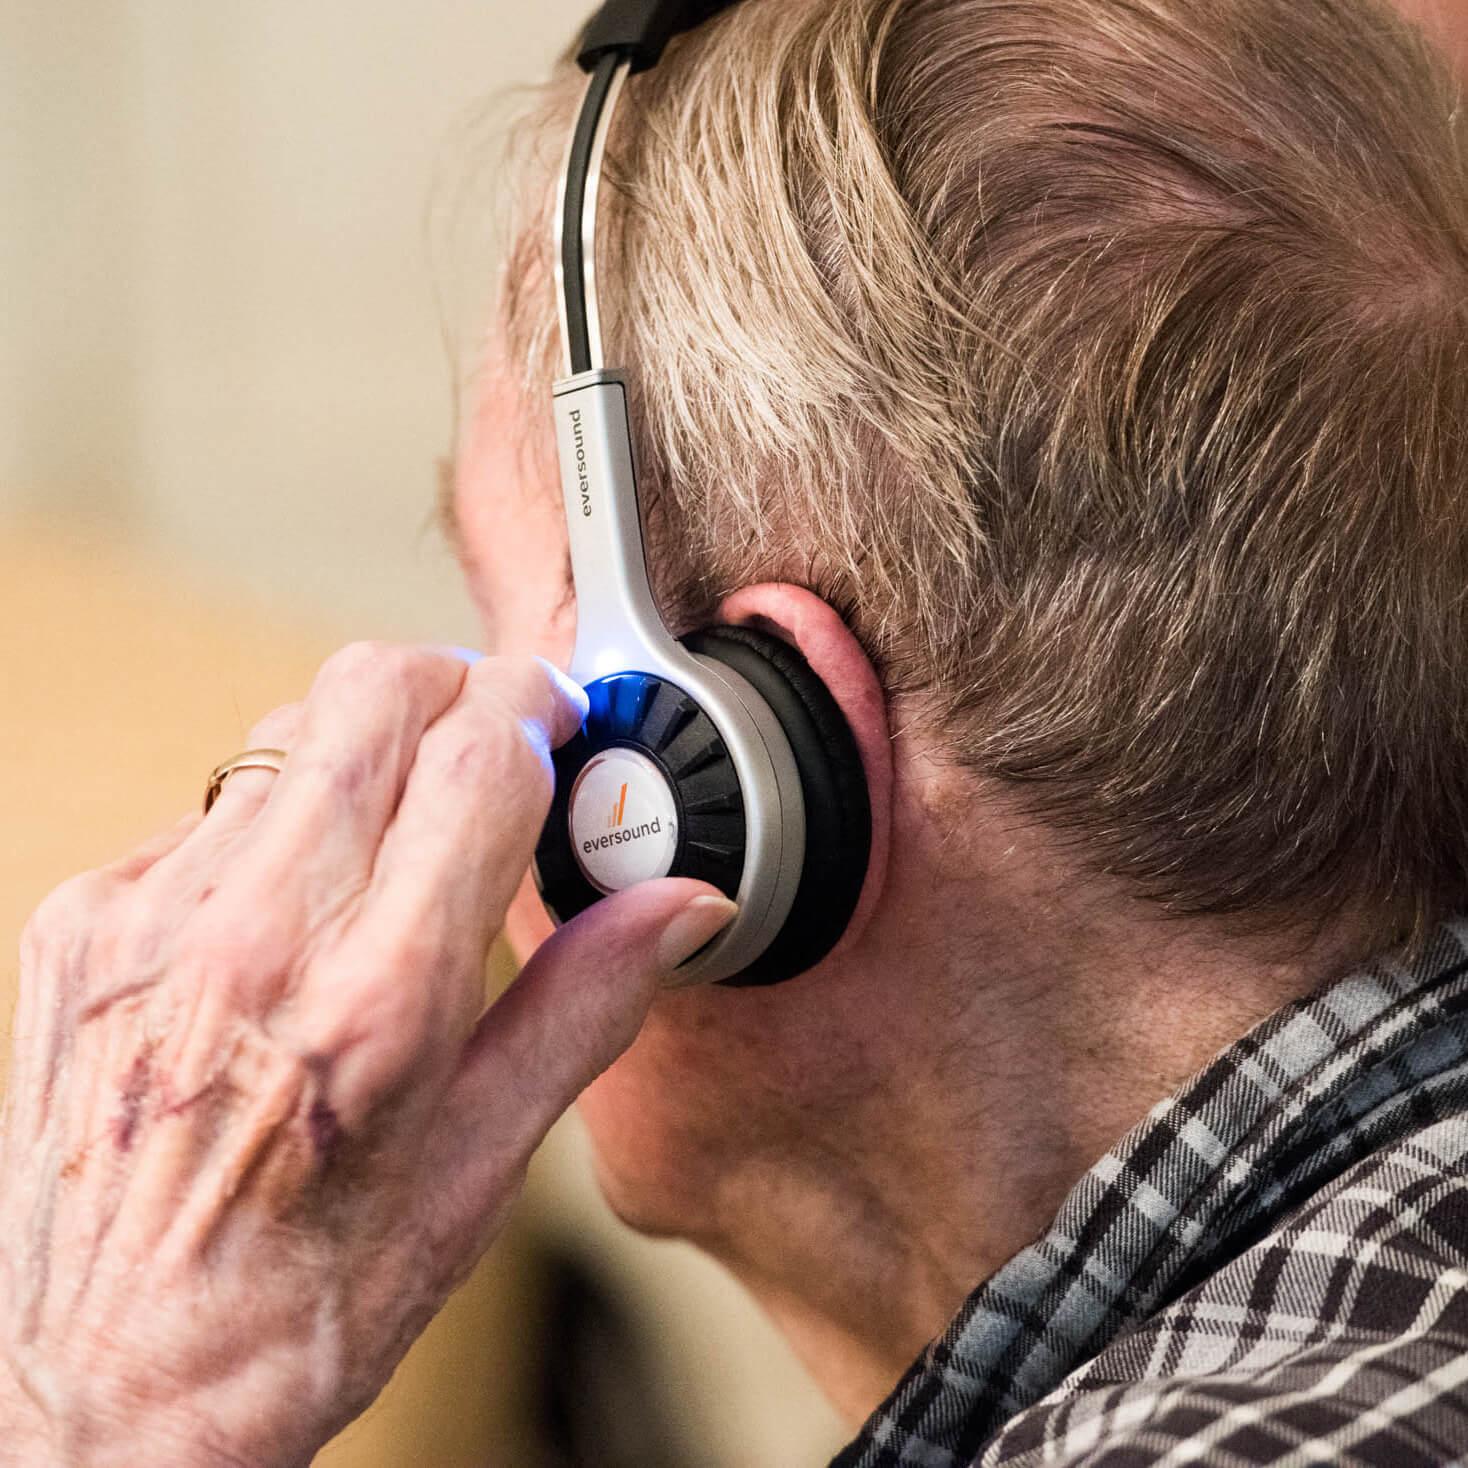 Eversound headphone controls